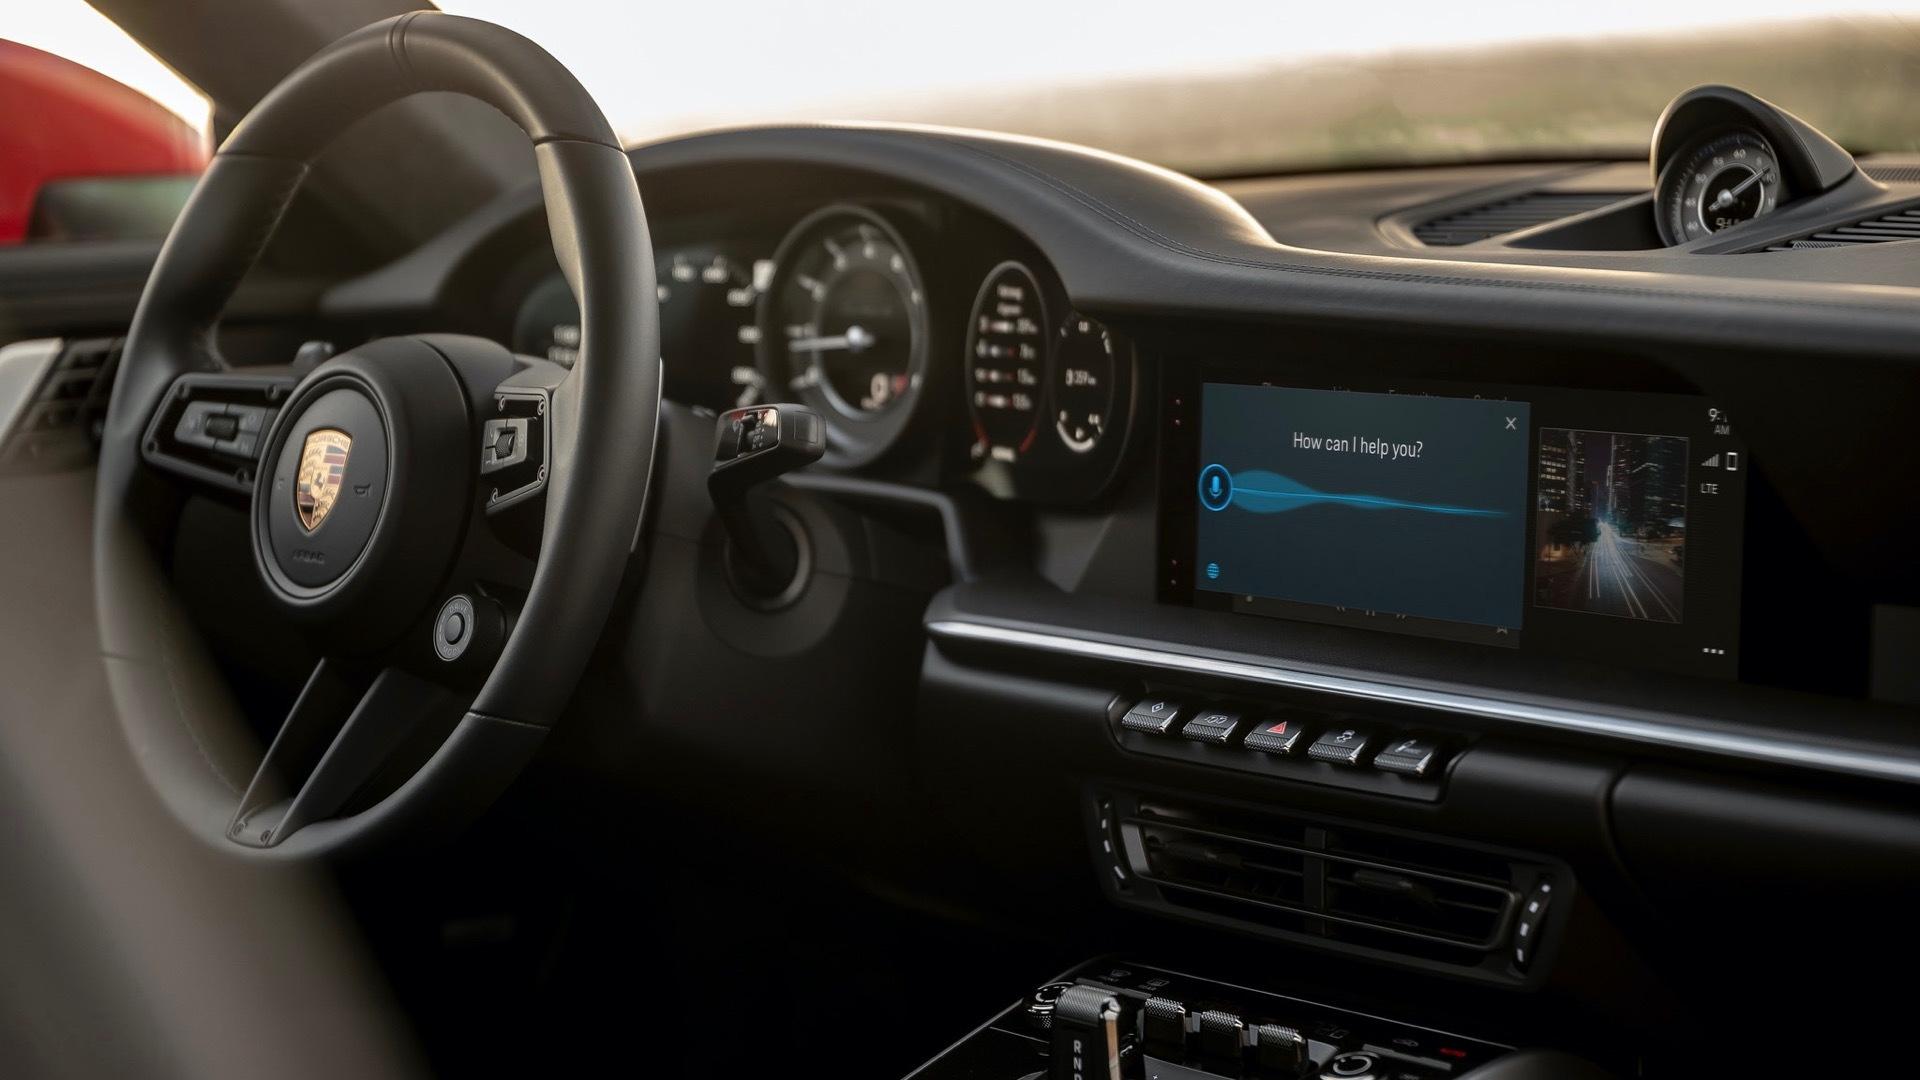 Porsche Communication Management 6.0